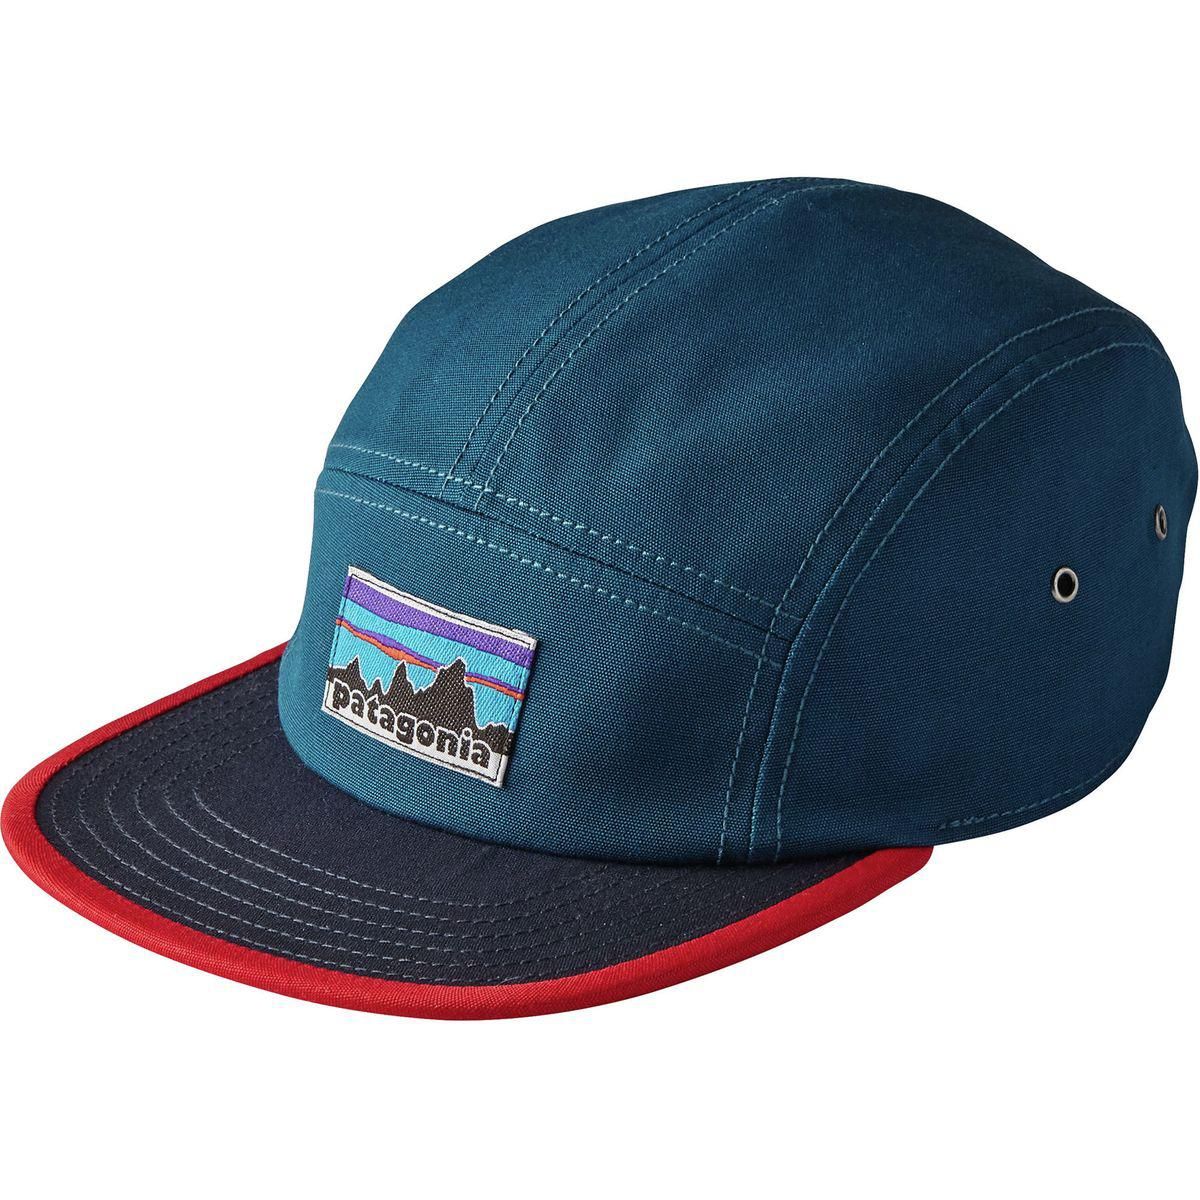 c4fe8b6d Patagonia Retro Fitz Roy Label Tradesmith 5-panel Cap in Blue for ...